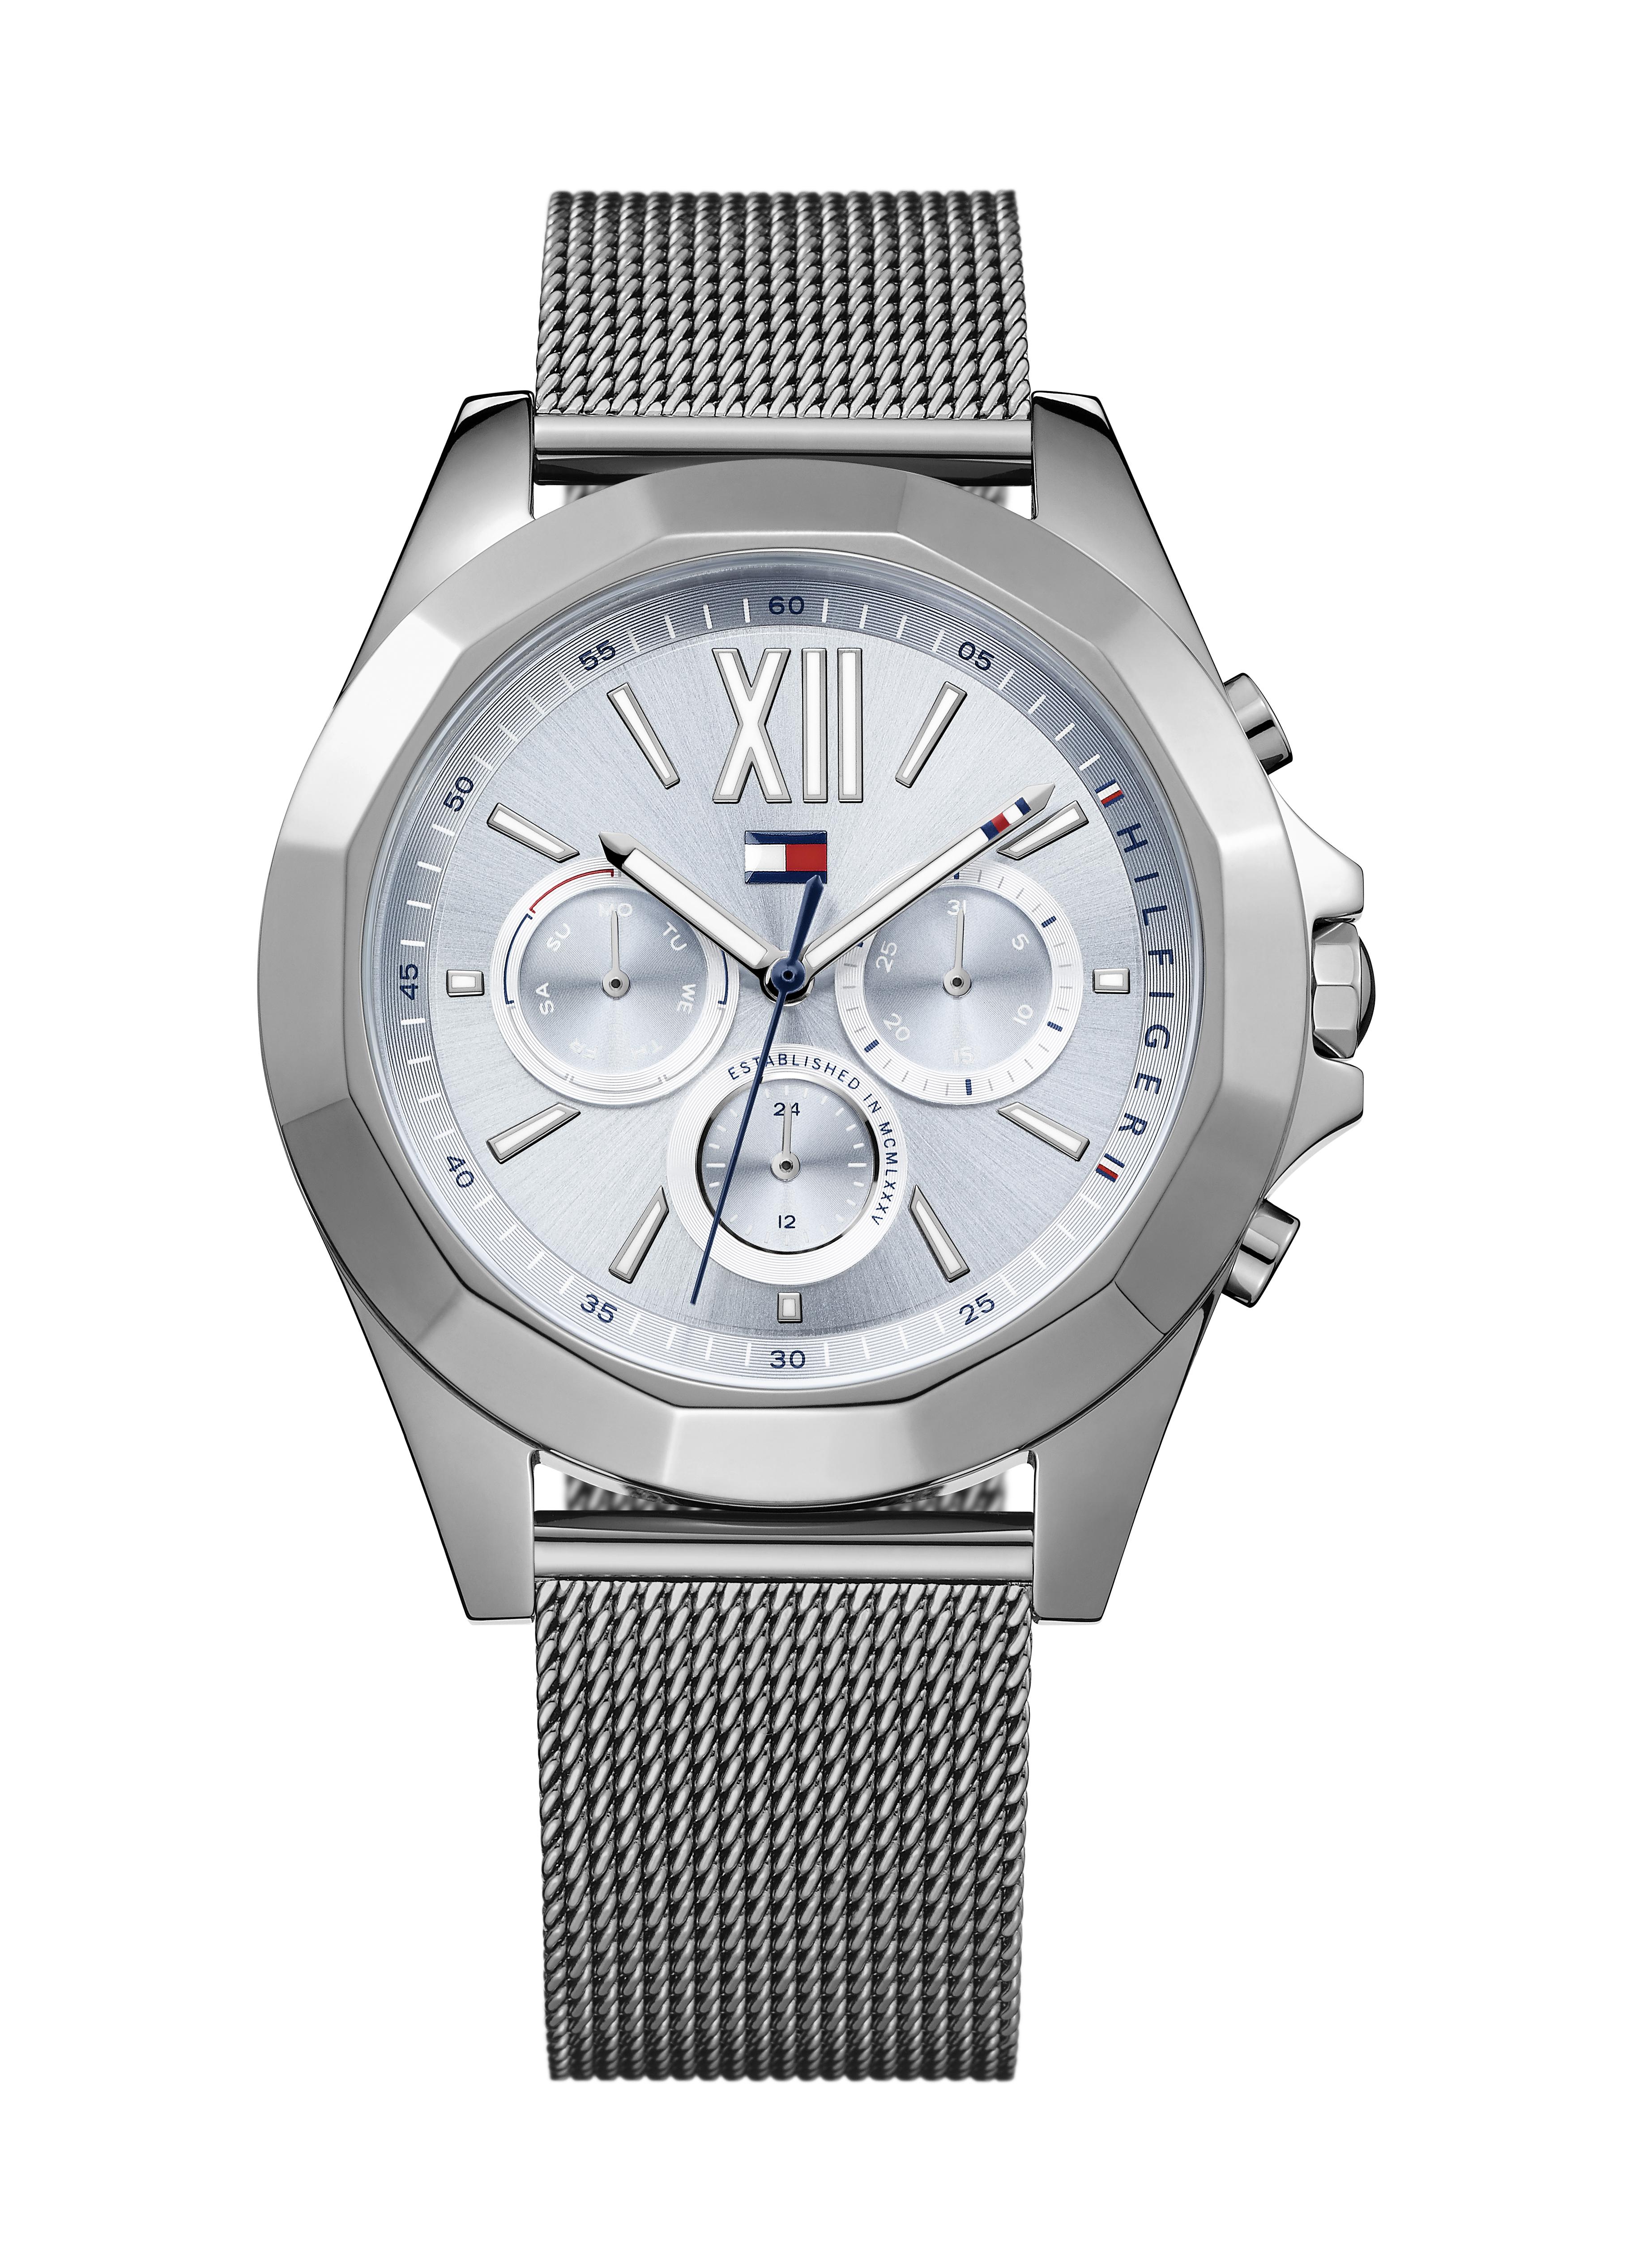 Tommy-Hilfiger-Chelsea-Ice-Blue-Watch-£175.00.jpg